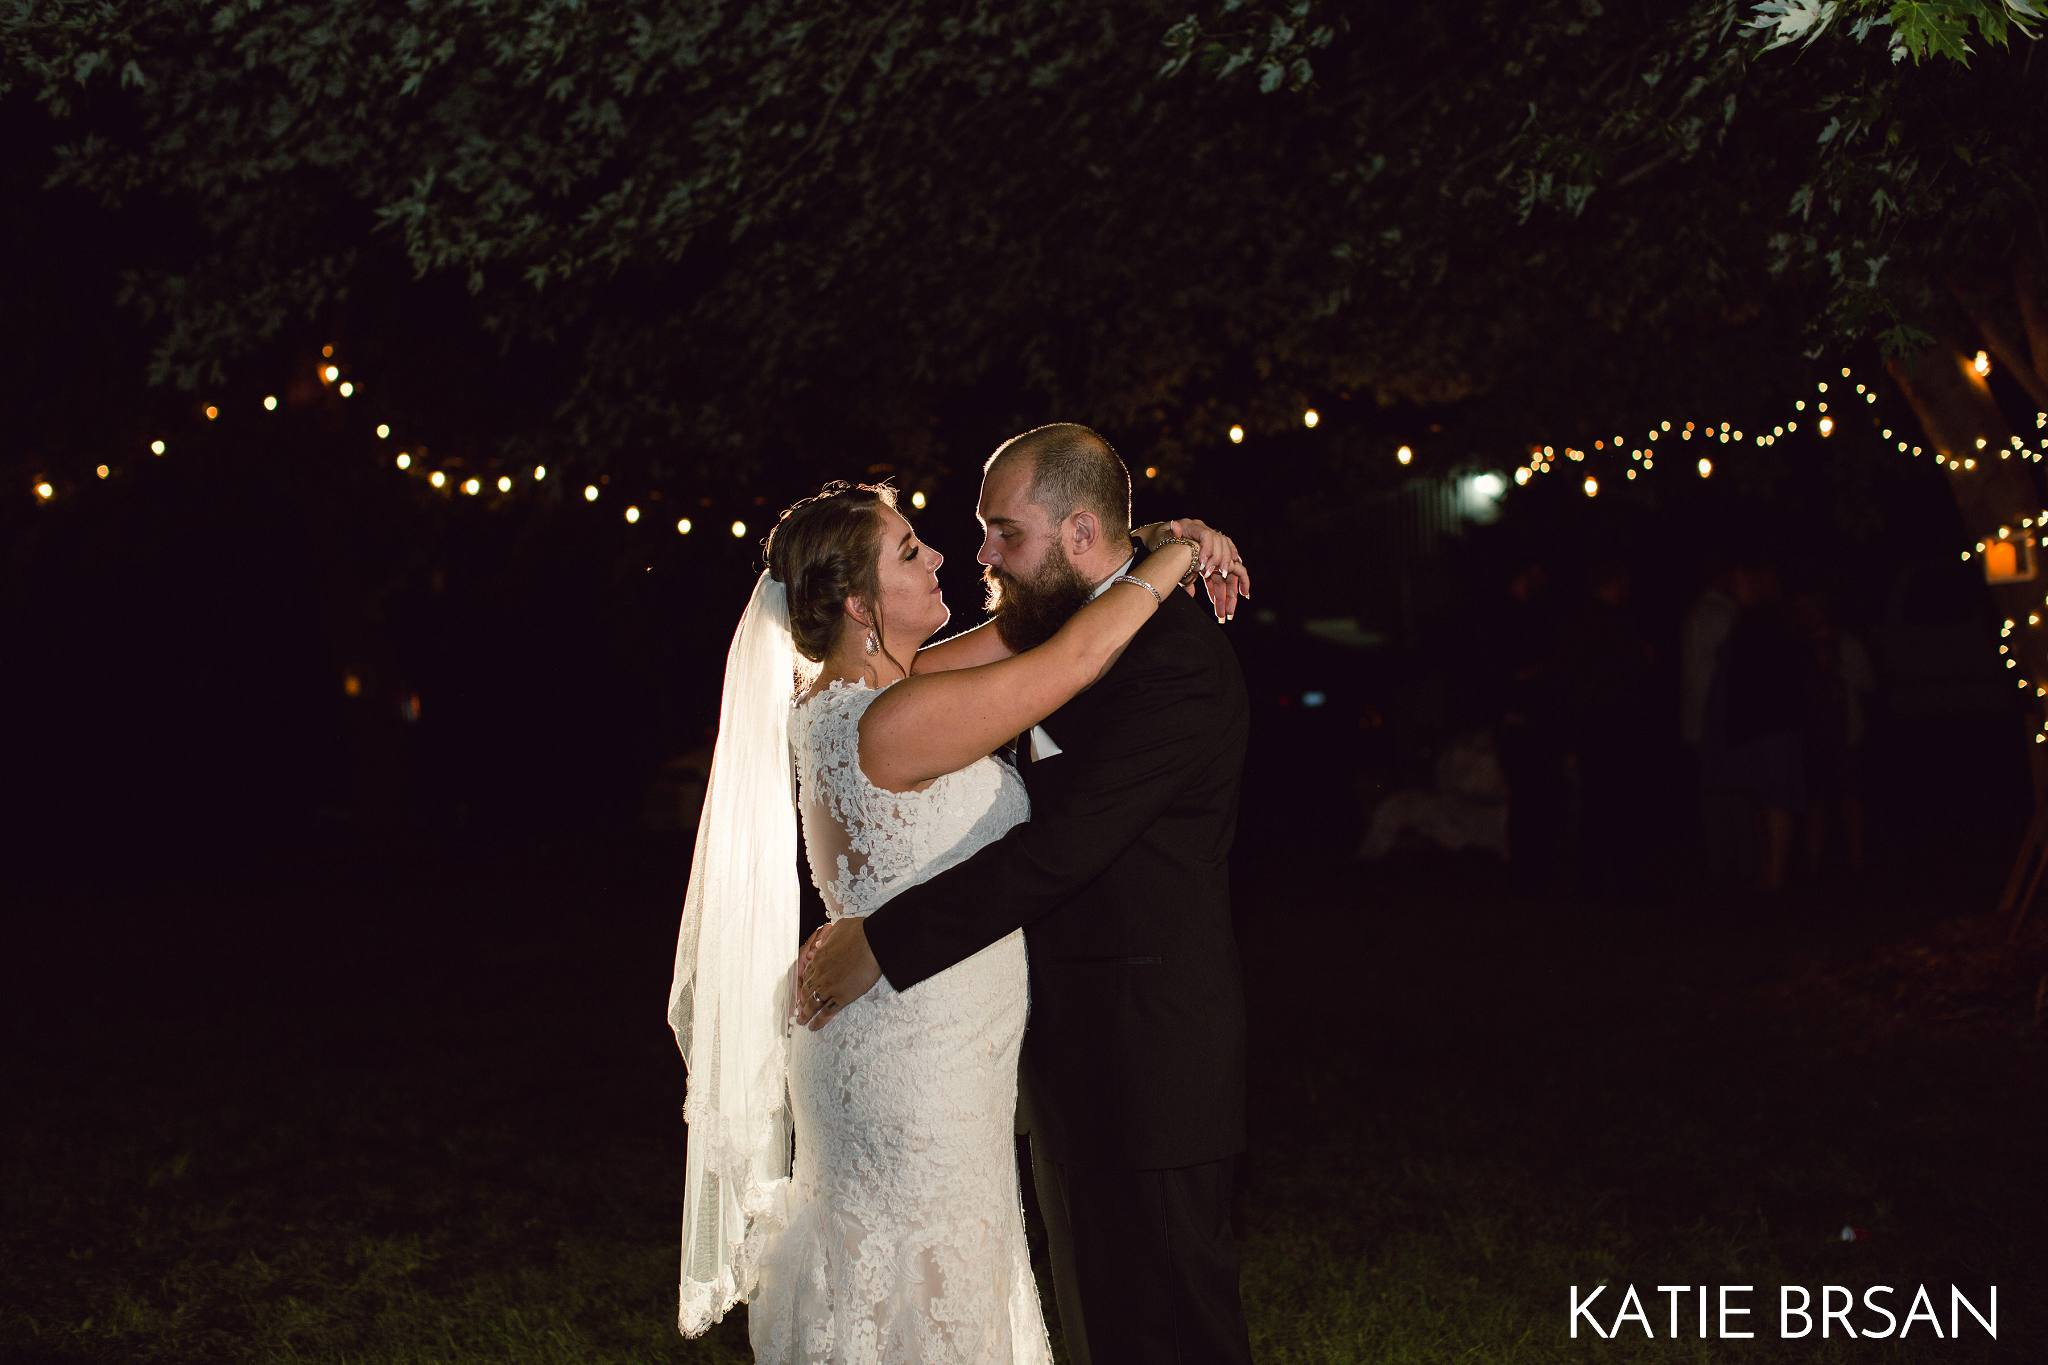 KatieBrsan-Bonfield-Backyard-Wedding_0436.jpg